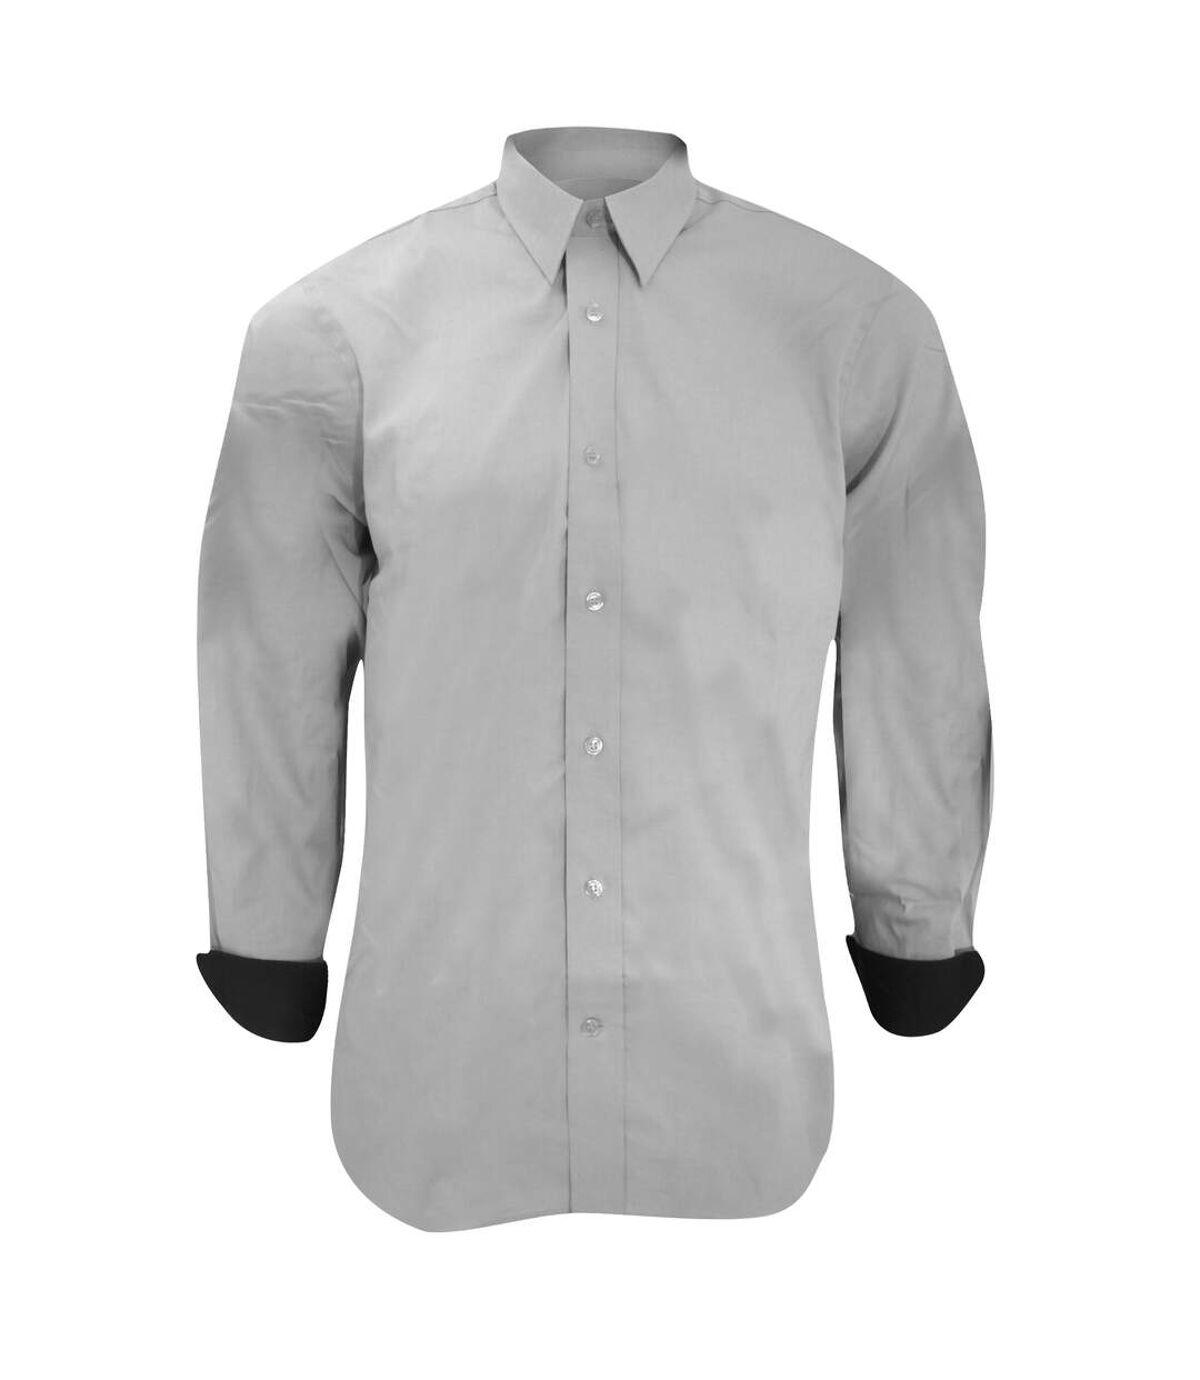 Kustom Kit Mens Long Sleeve Contrast Premium Oxford Shirt (Silver Grey/ Charcoal) - UTBC1445